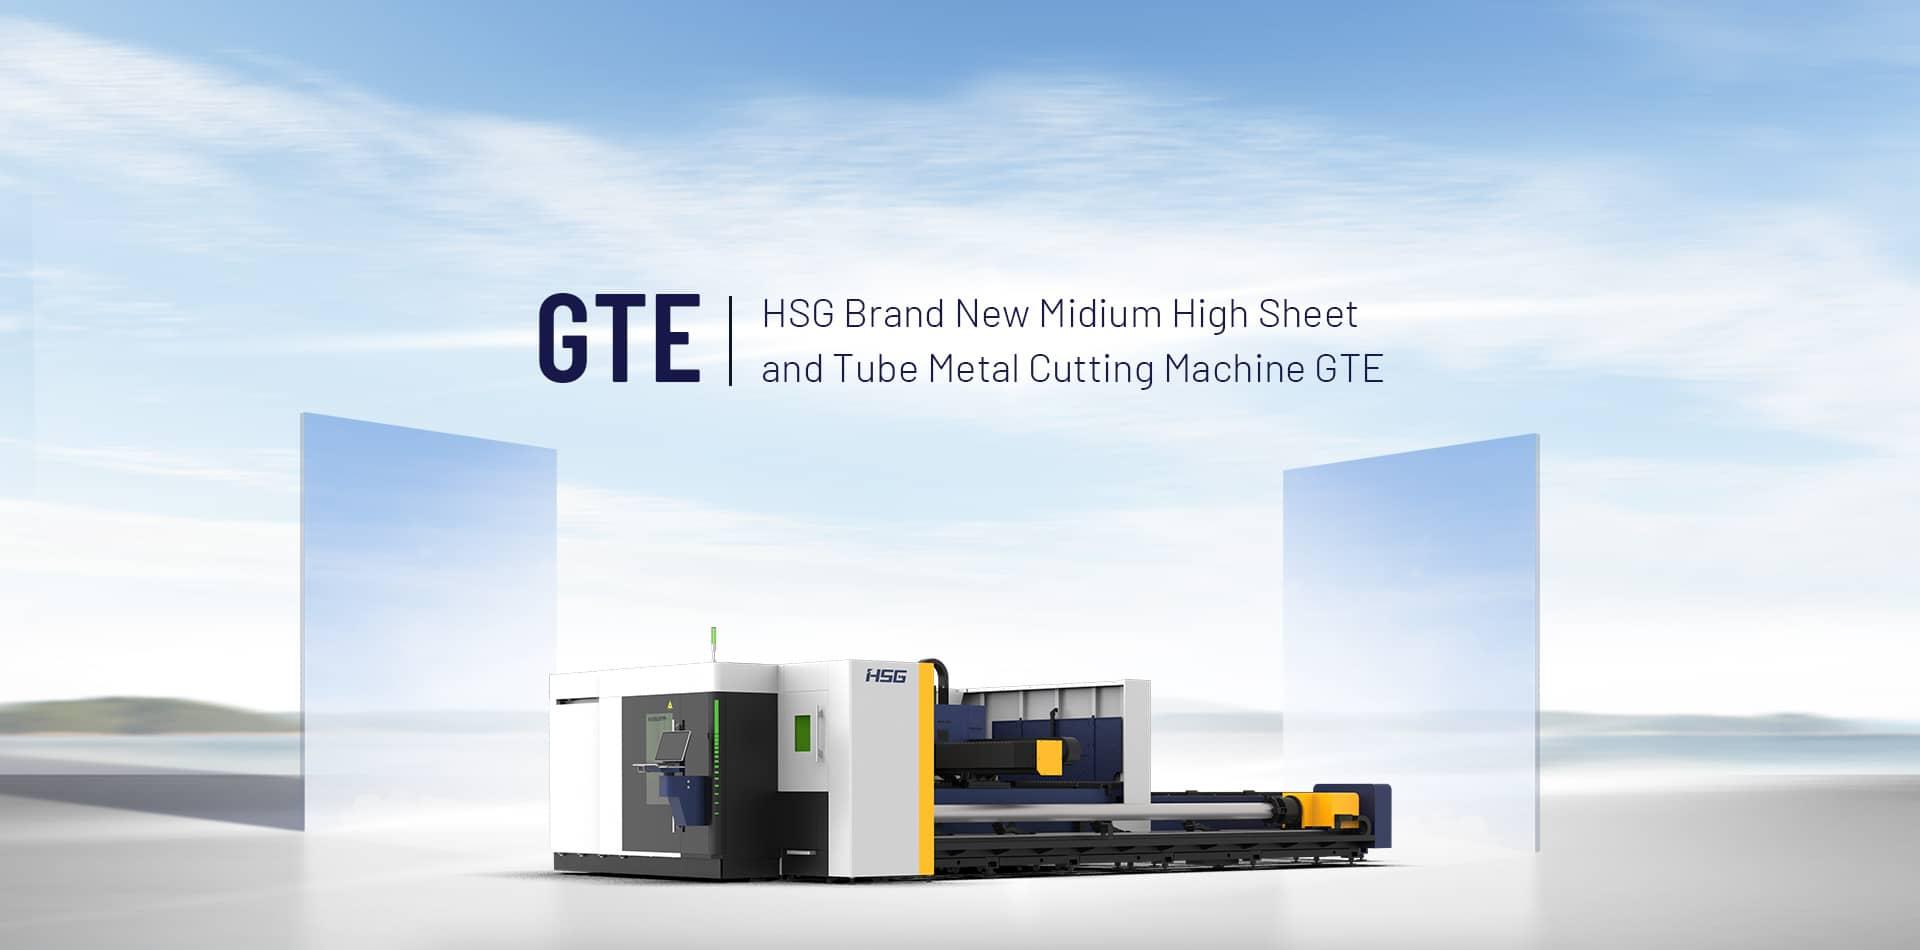 GTE Brand New Medium High Sheet & Tube Metal Cutting Machine